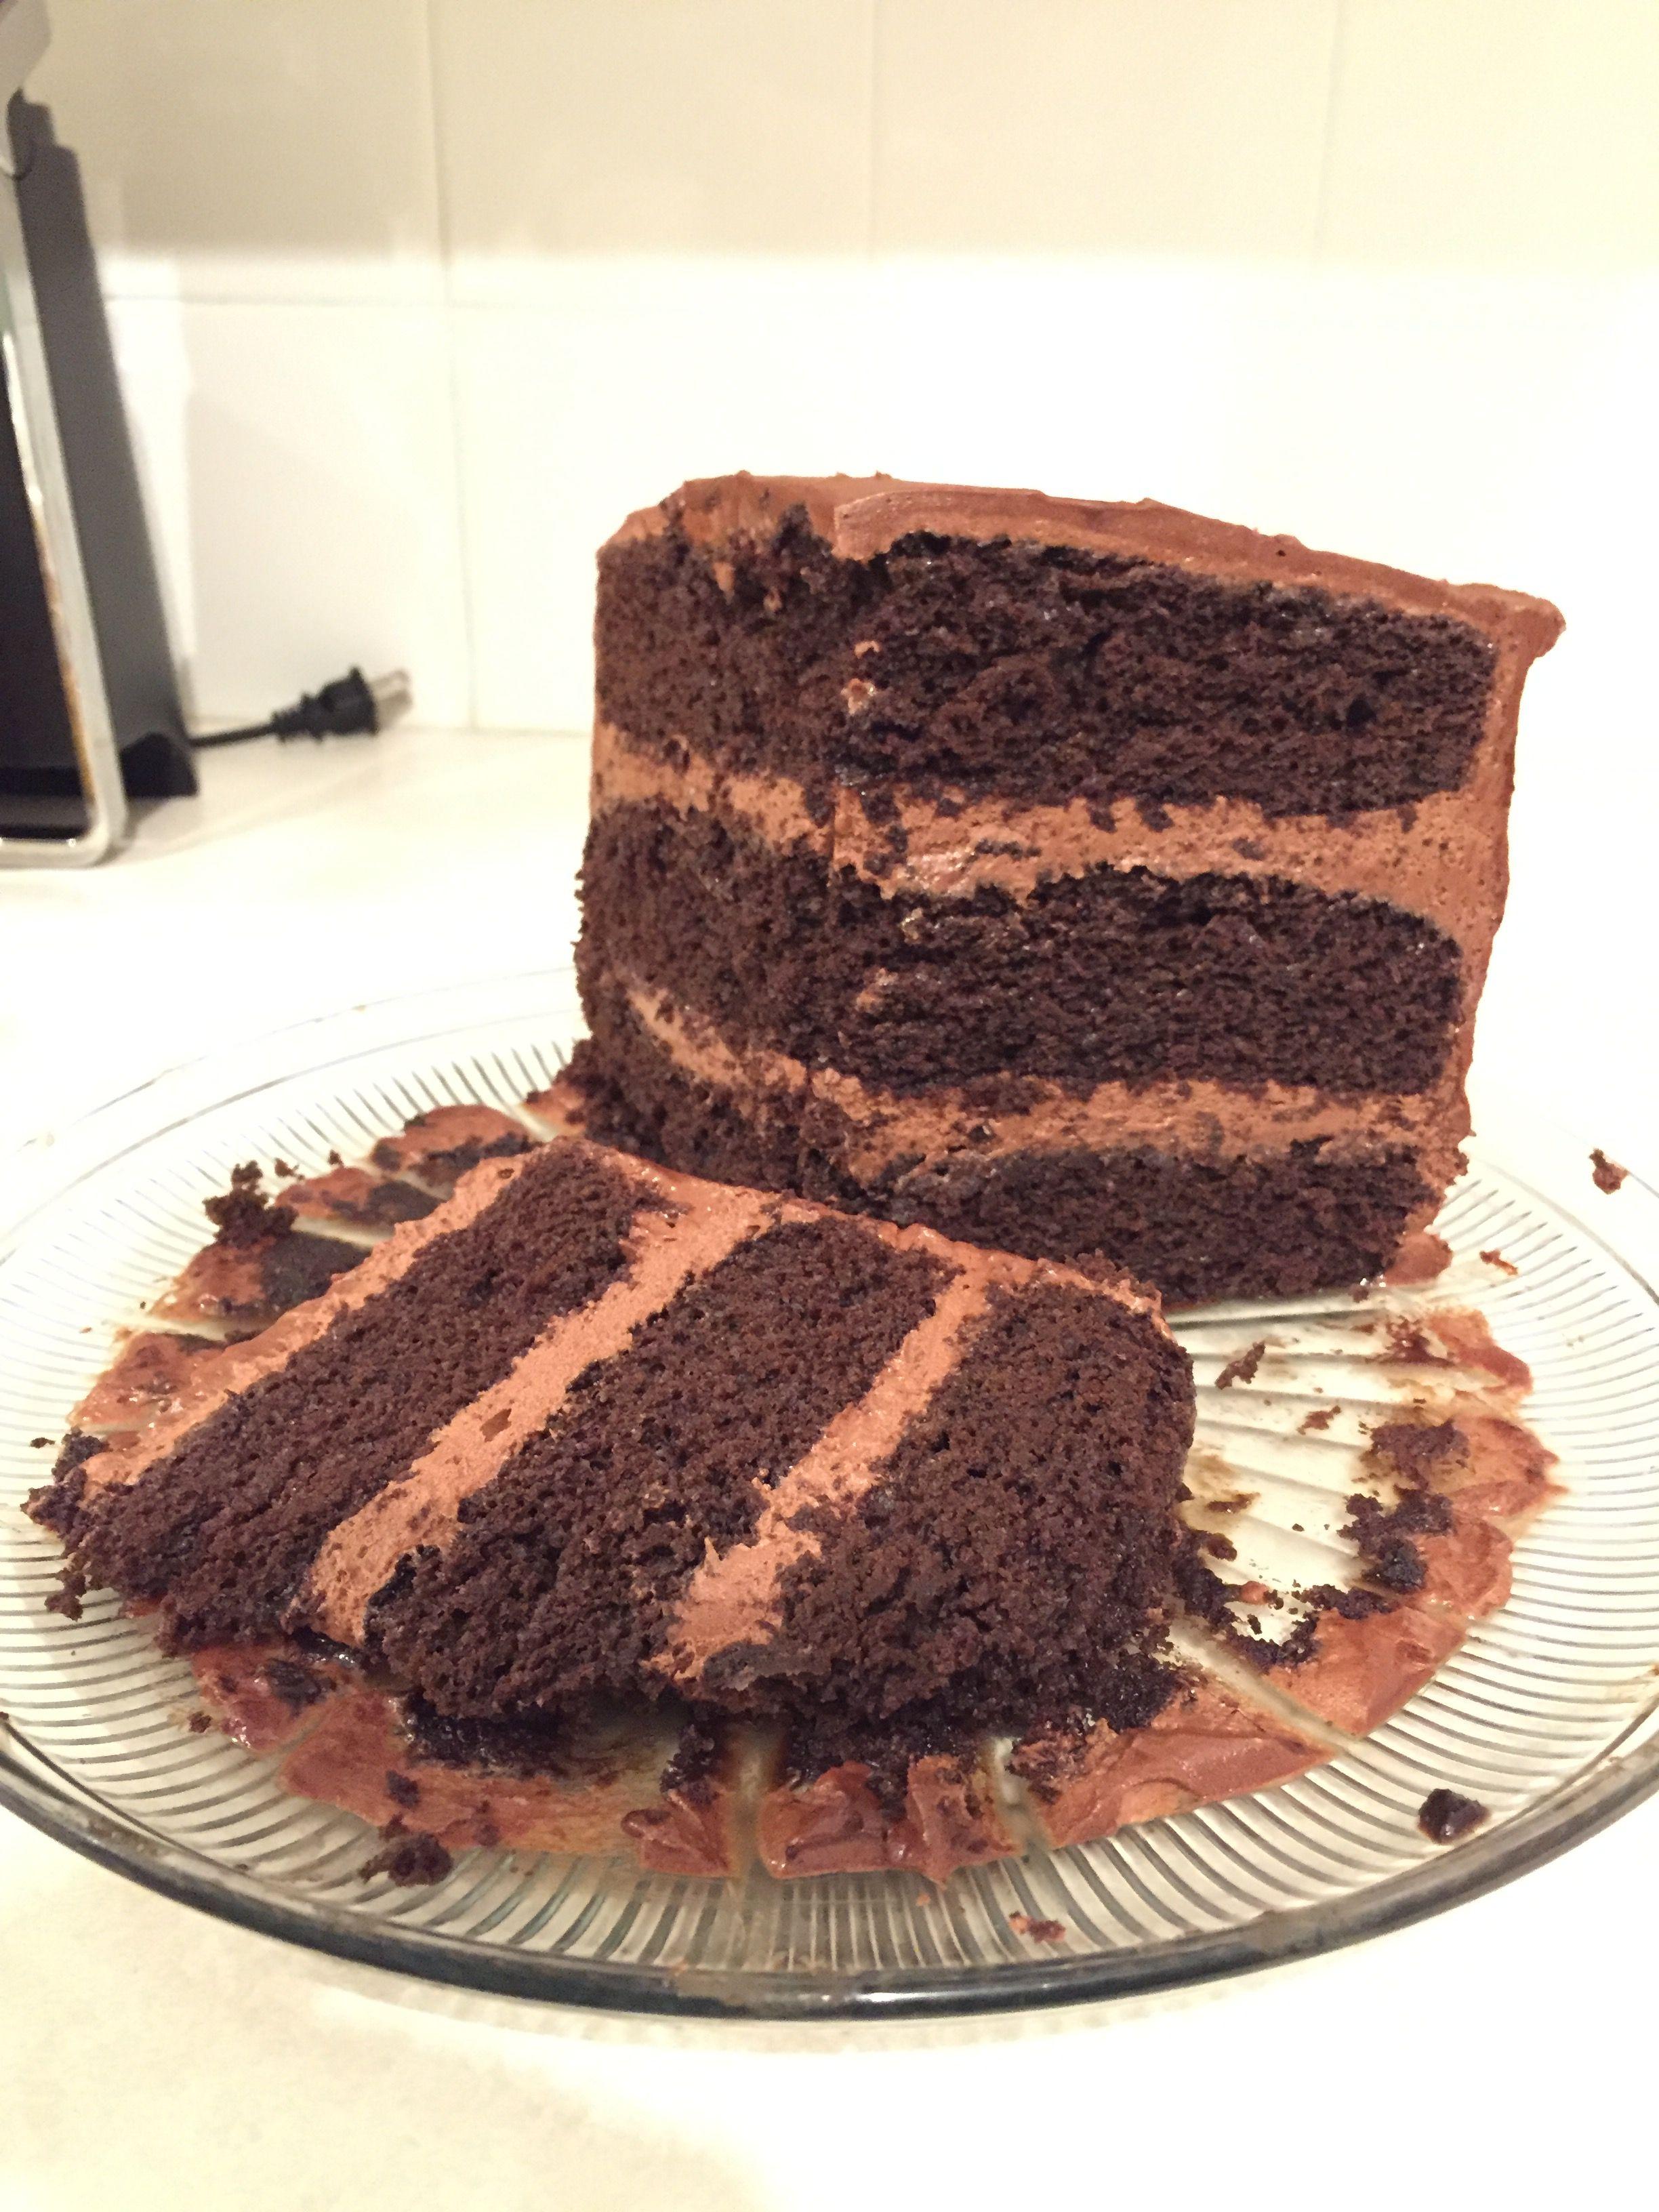 Devilishly moist cake sliced everyone loved it i used